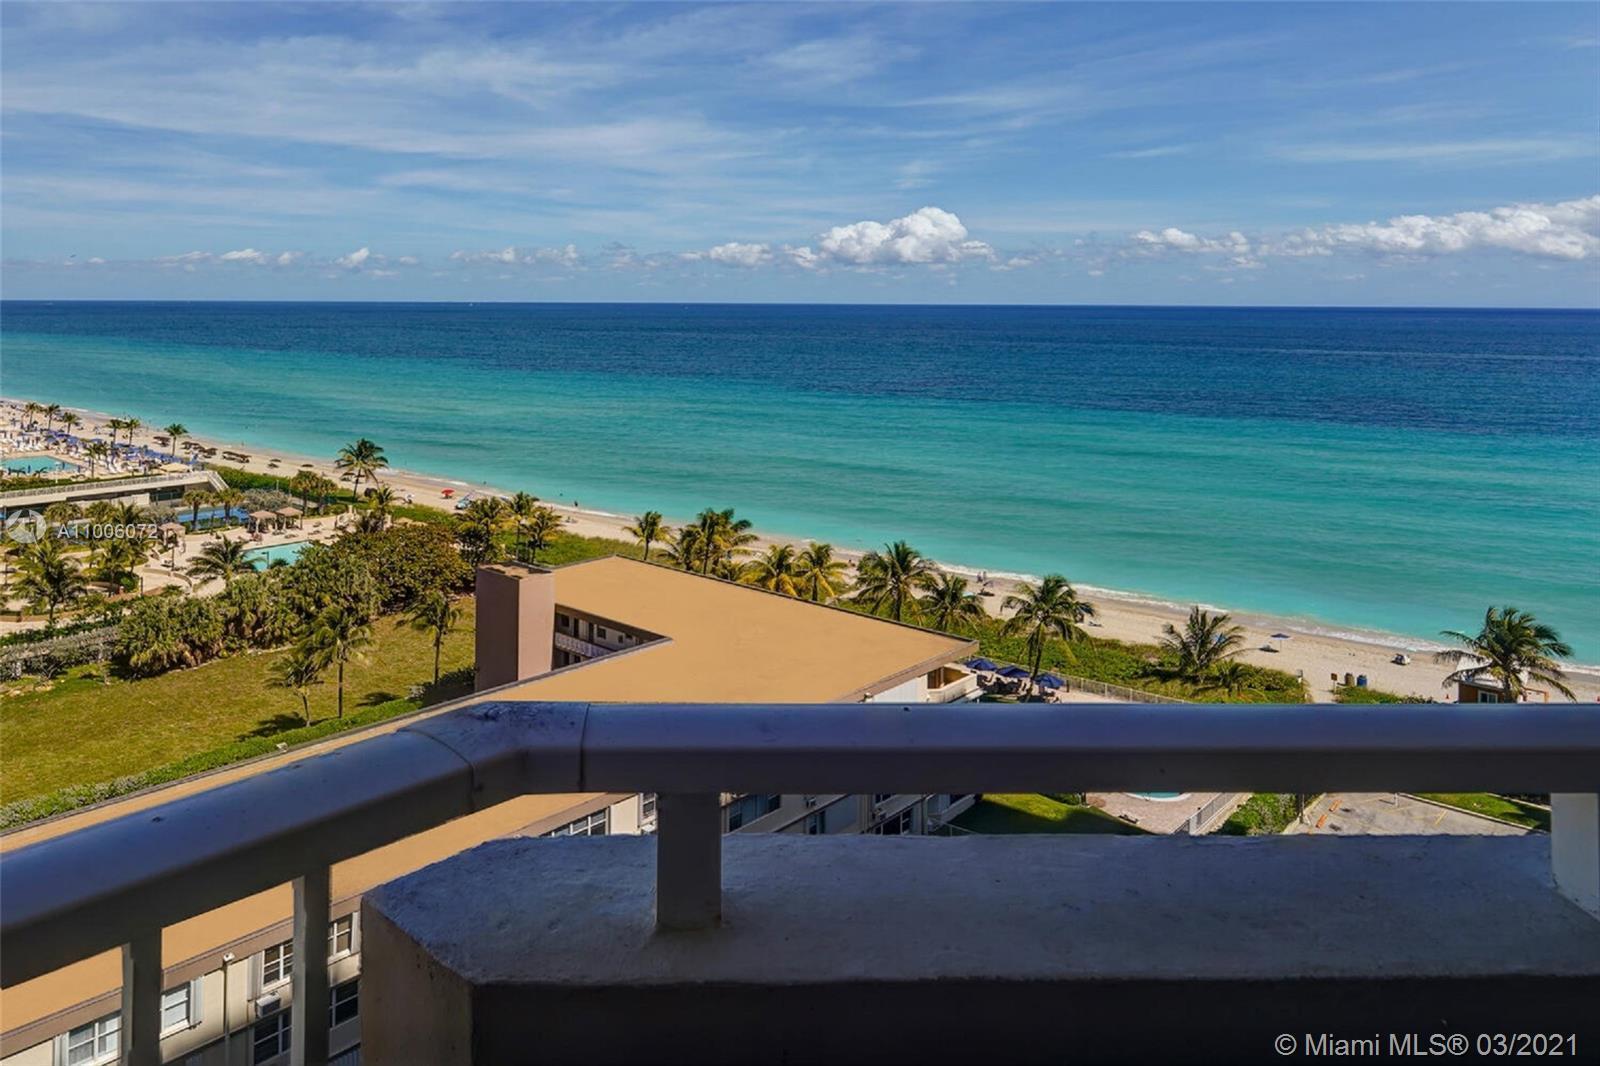 Hemispheres has it all! Resort style living on the ocean, amenities include both ocean & intracoasta